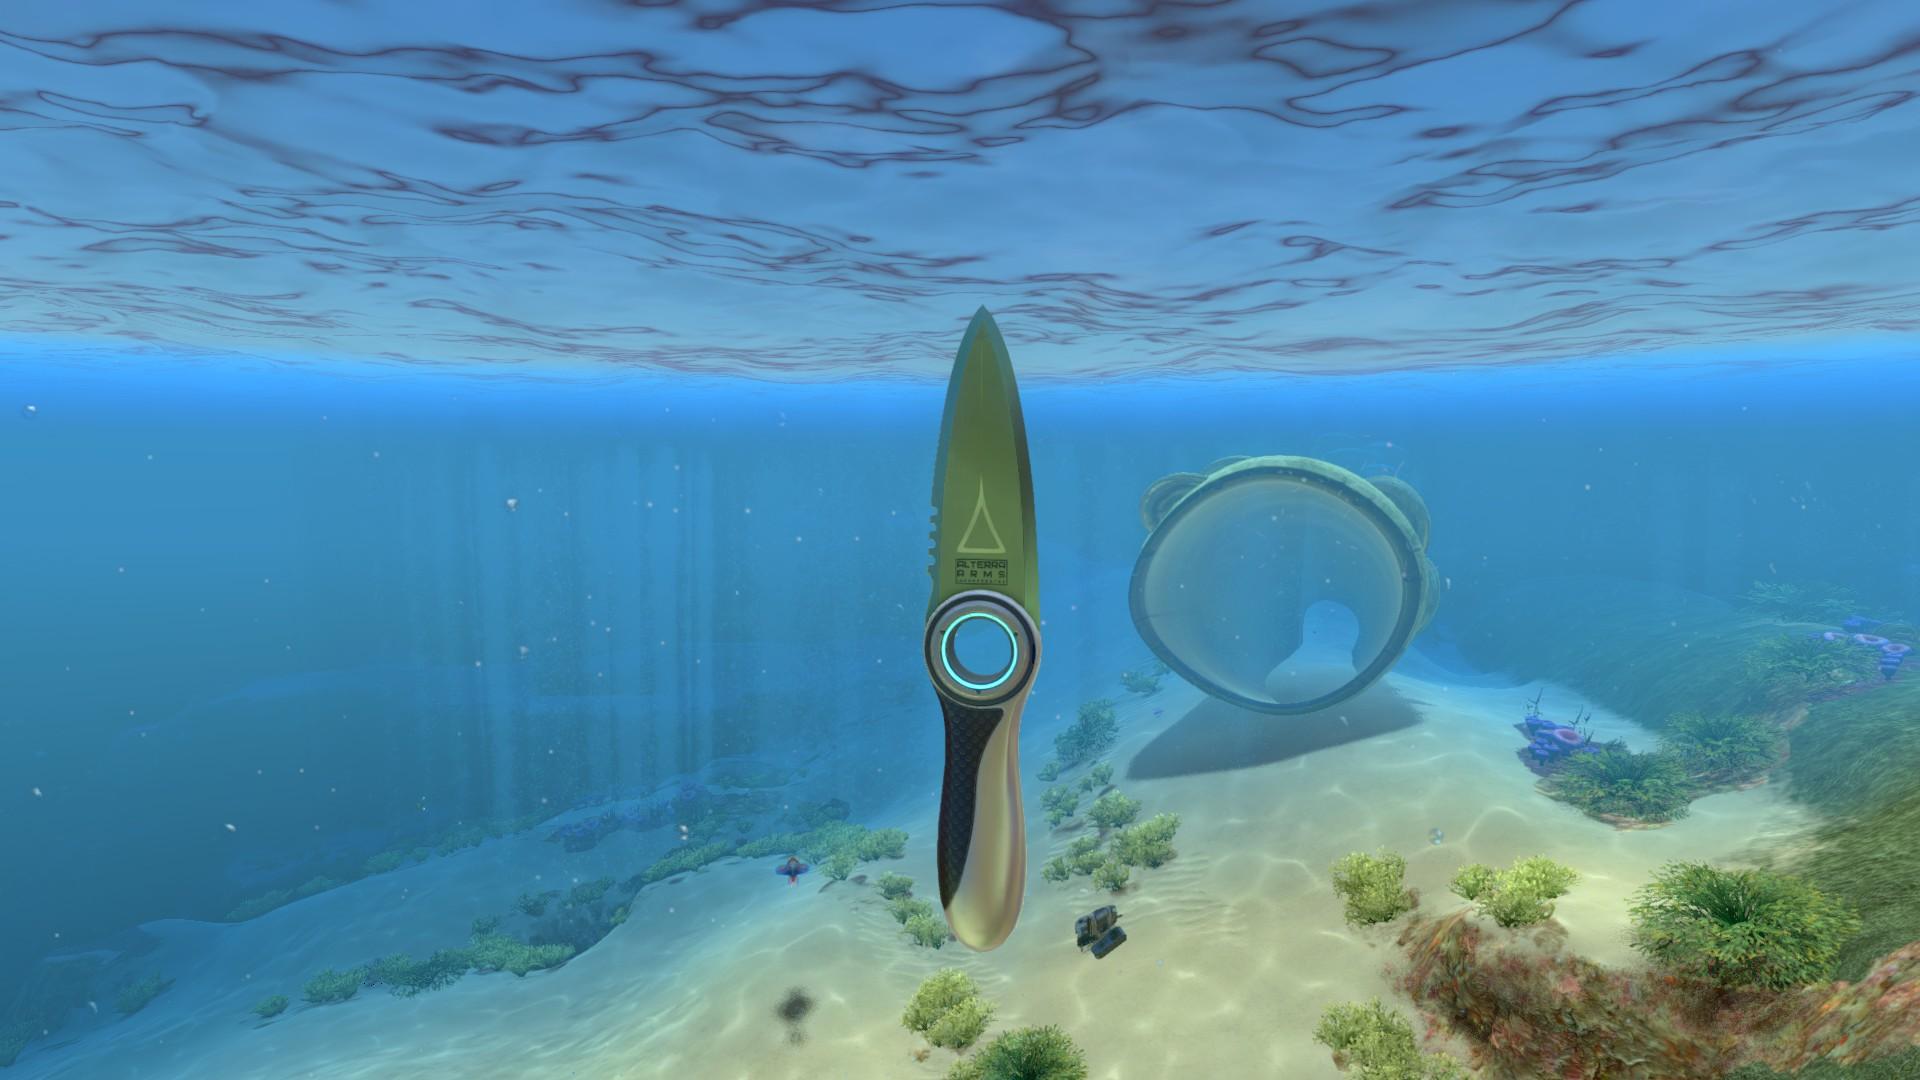 Survival Knife Subnautica Wiki Fandom Powered By Wikia